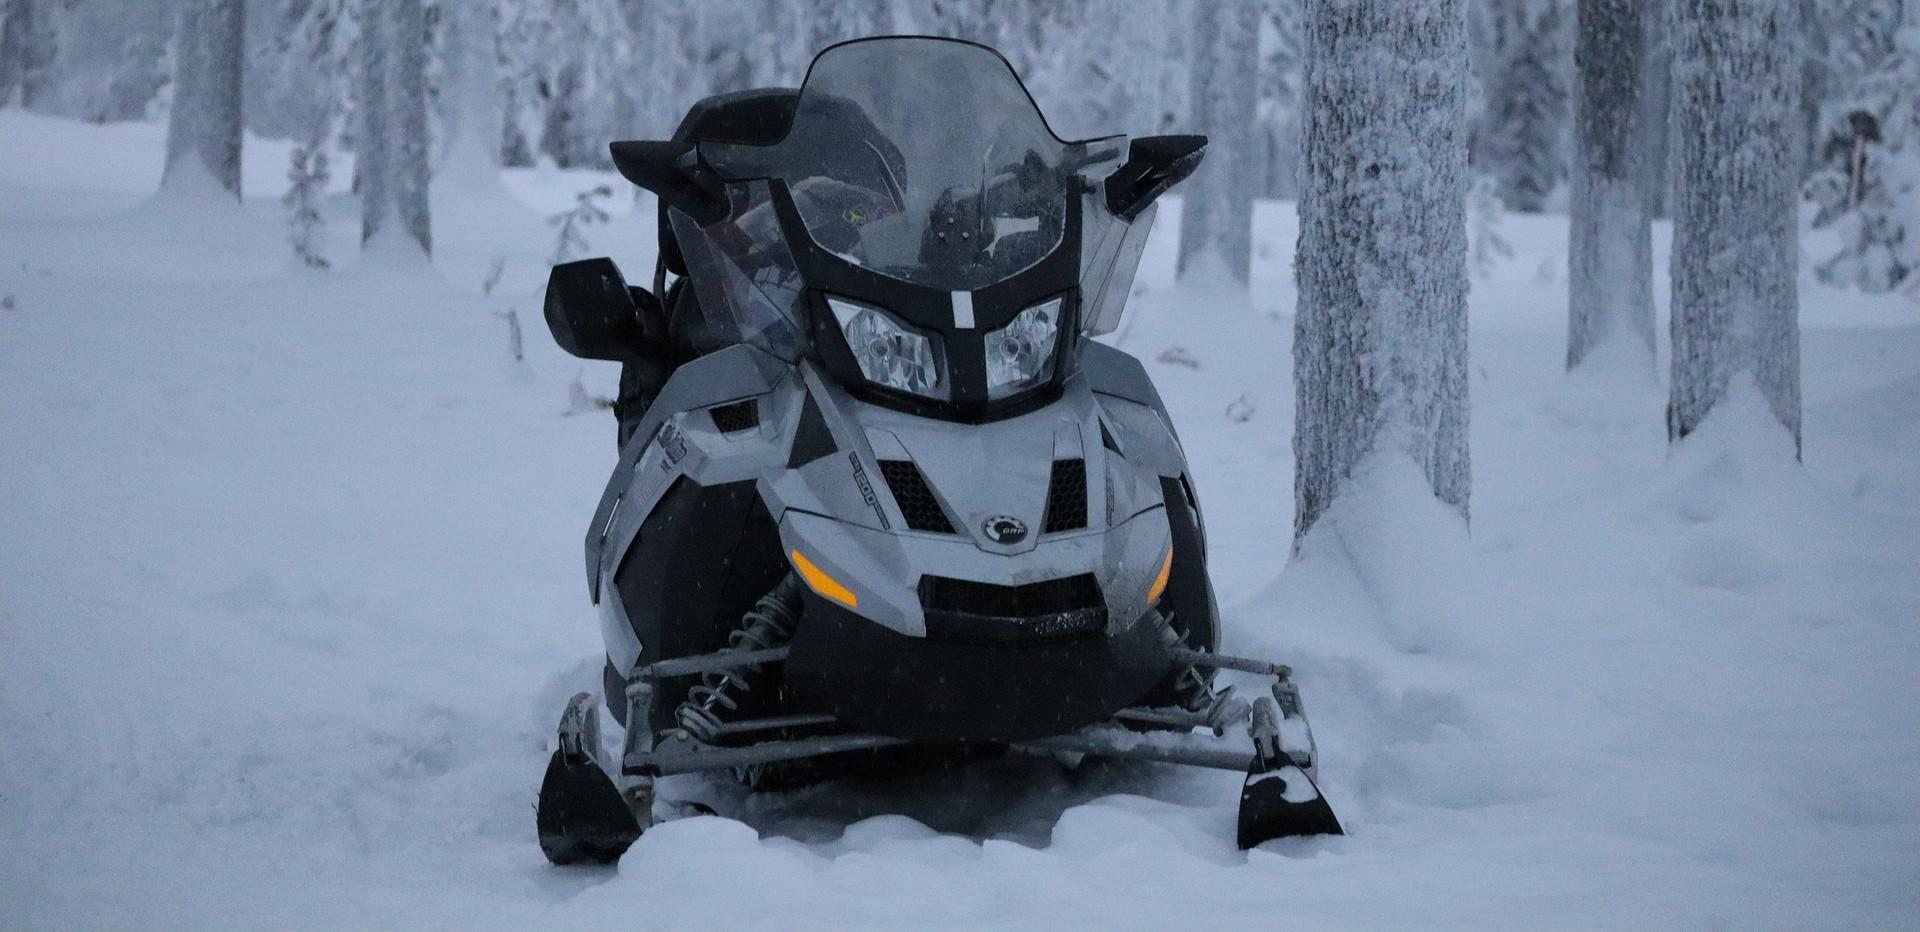 Sitting Snowmobile